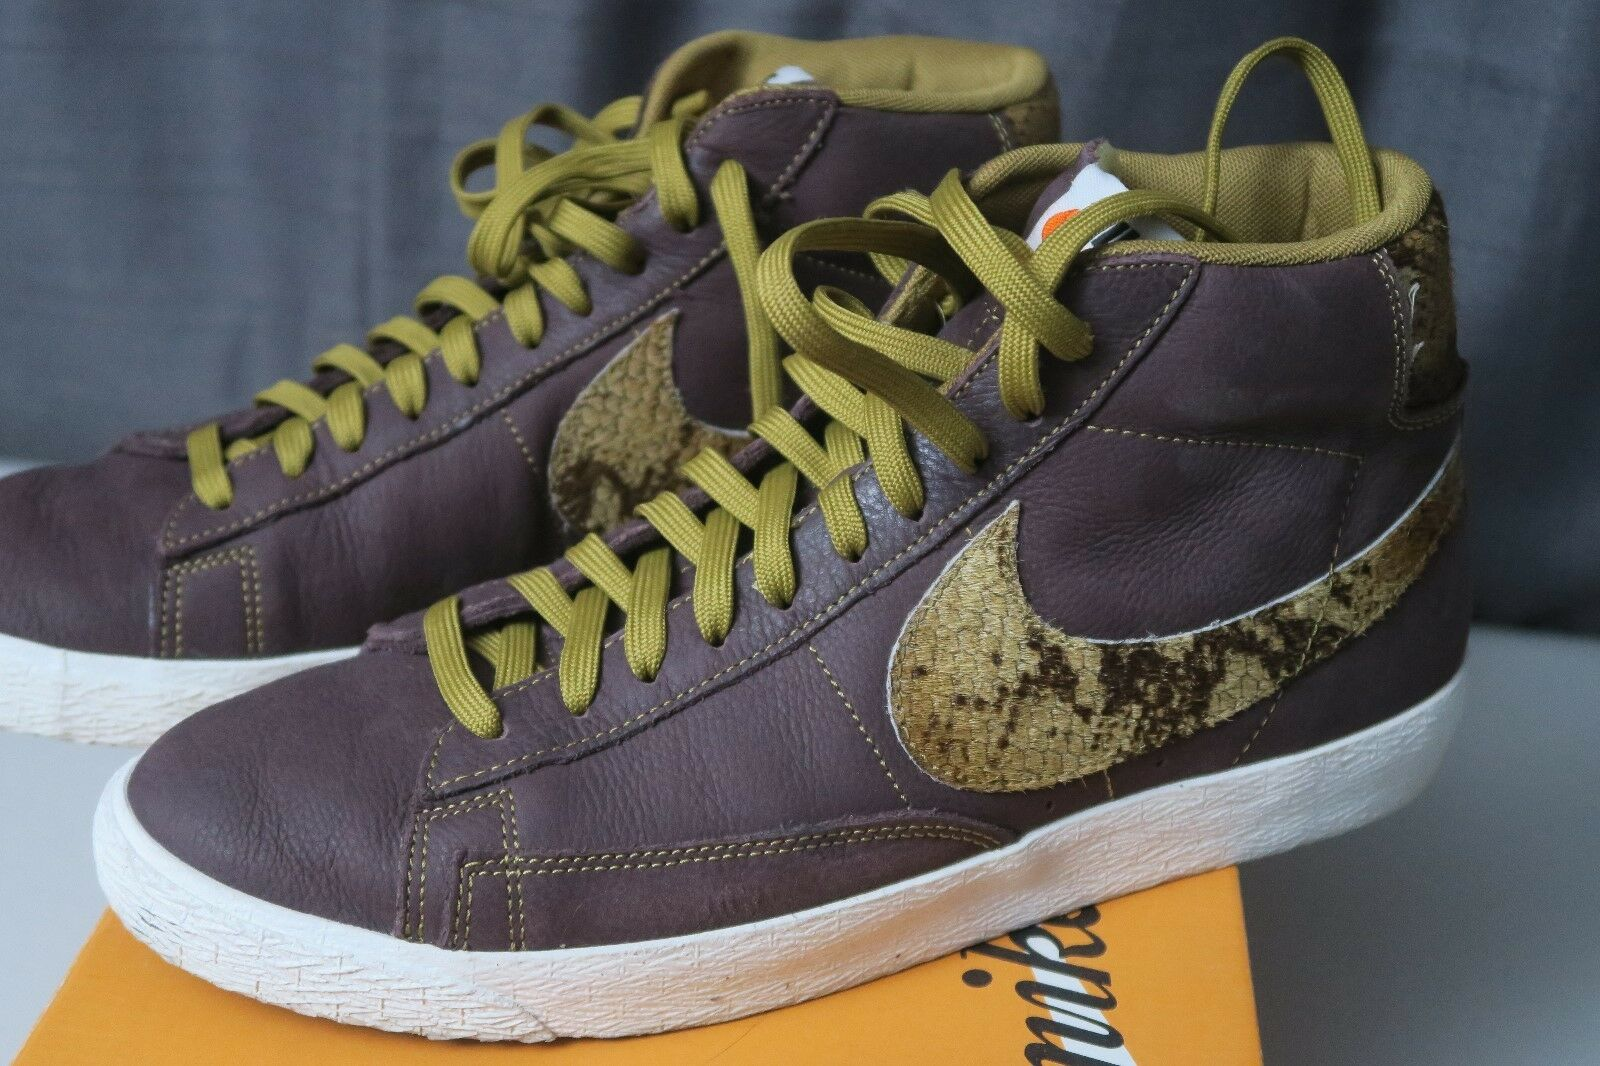 Nike Blazer Mid Premium Vintage VNTG QS Mahogany Sail 638322-200 Size 10.5